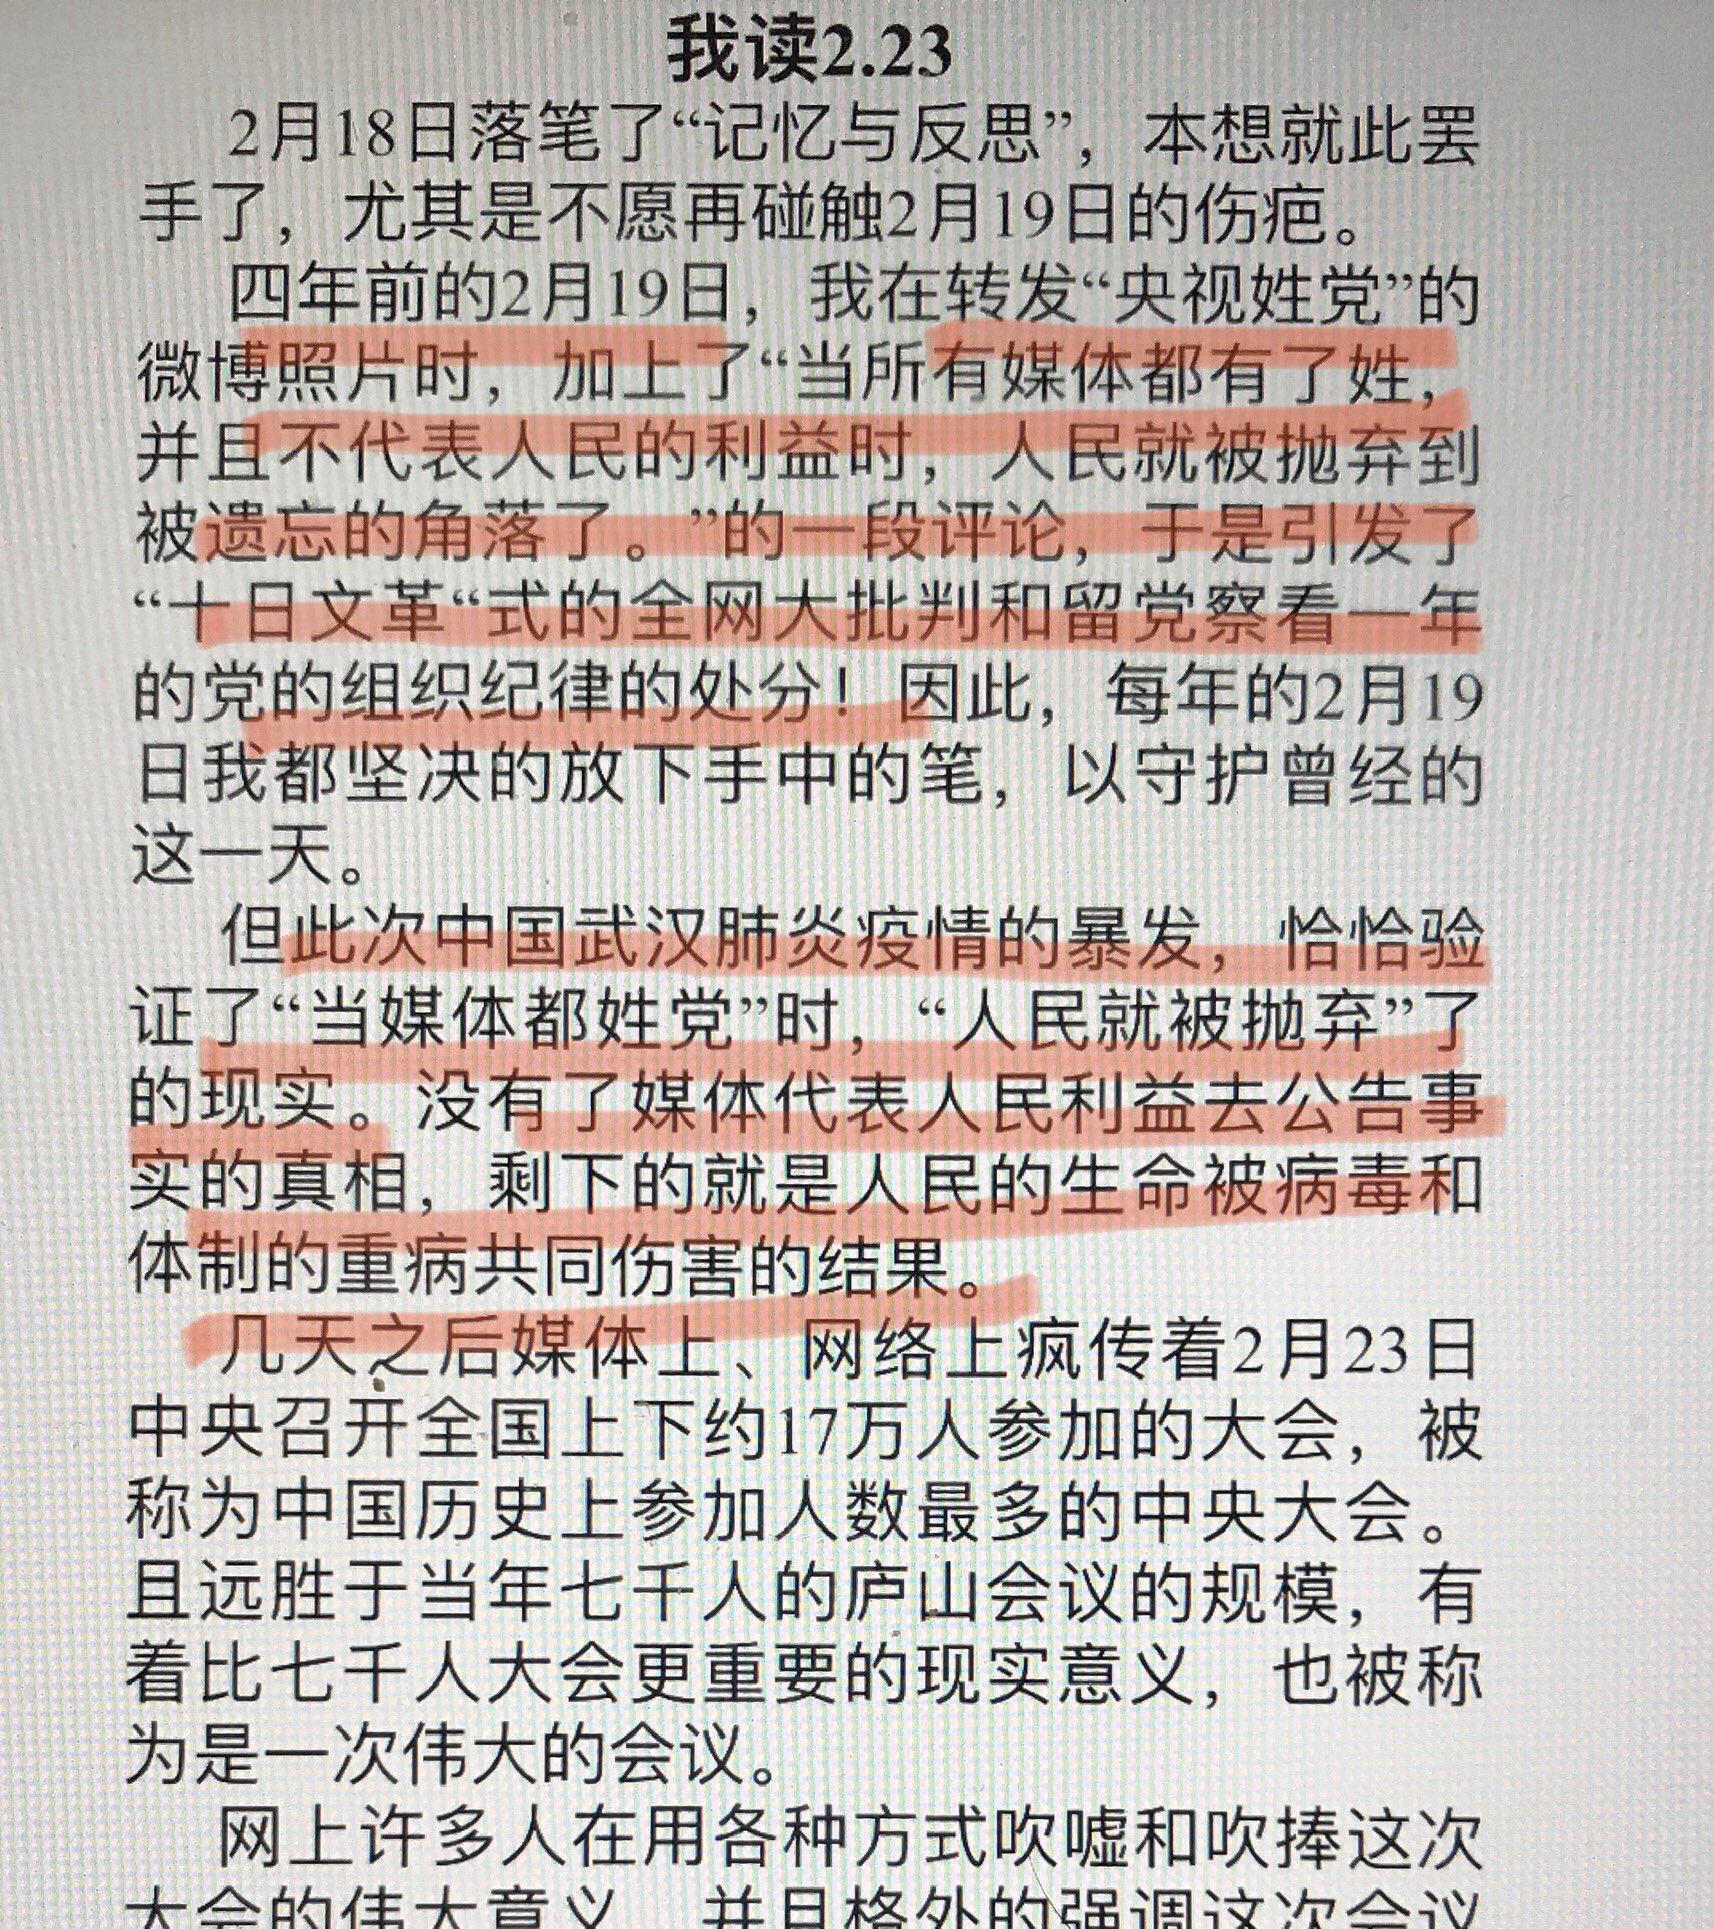 https://pbs.twimg.com/media/ES9qIRNX0AEFhnH?format=jpg&name=orig